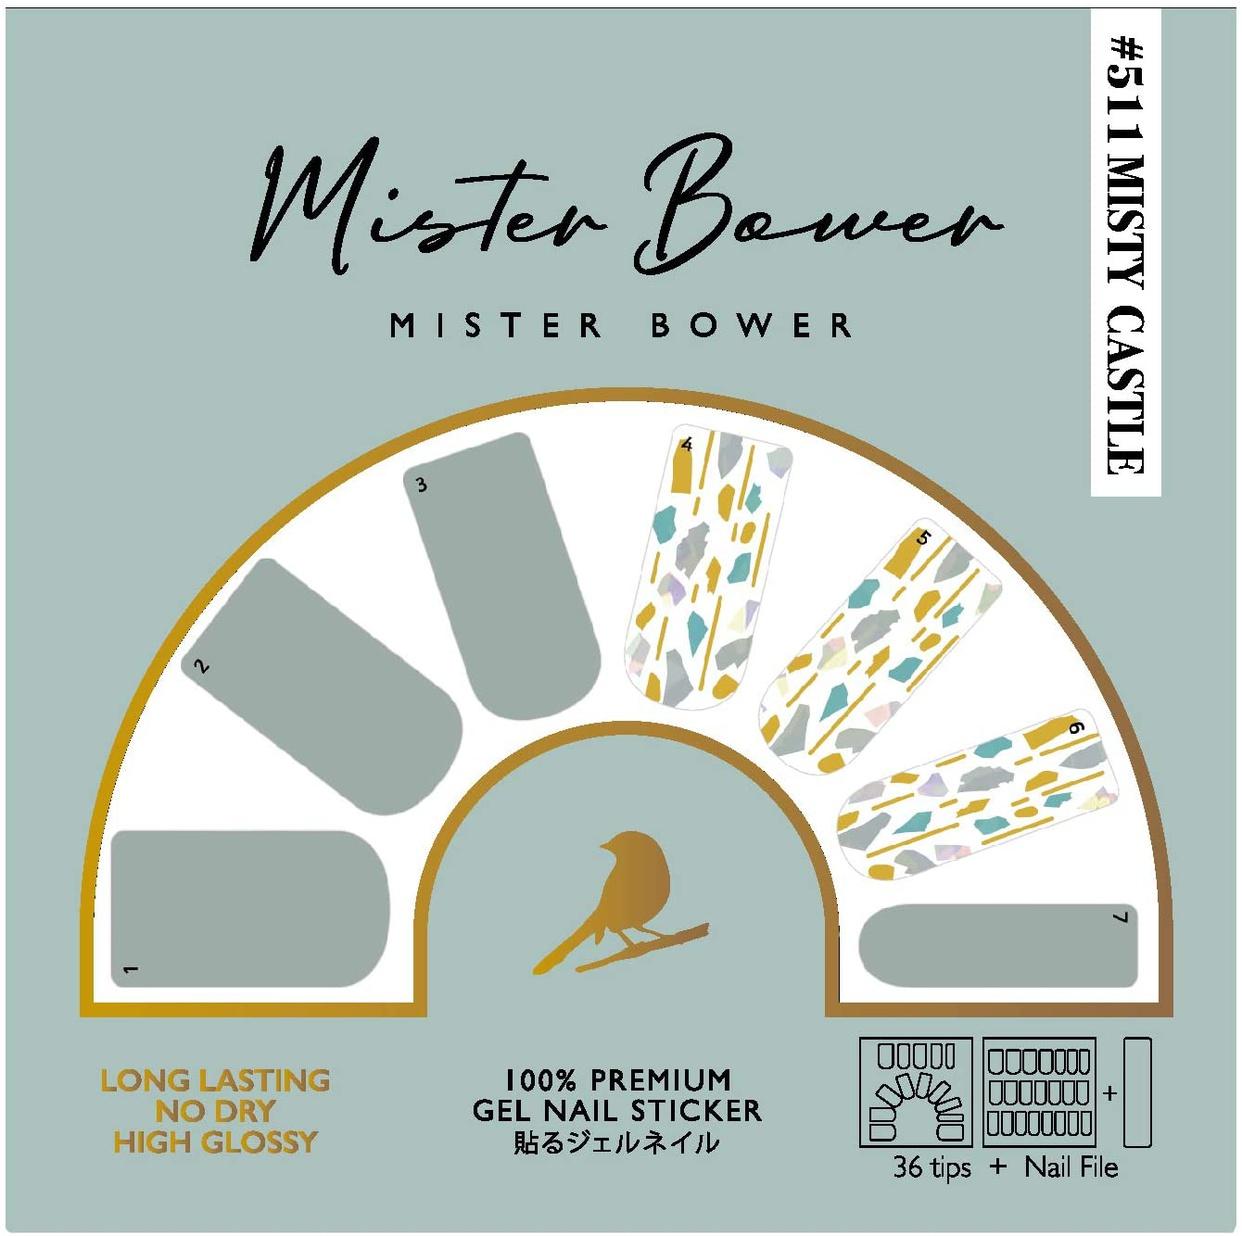 MISTEAR BOWER(ミスターバウアー) #511 MISTY CASTLEの商品画像